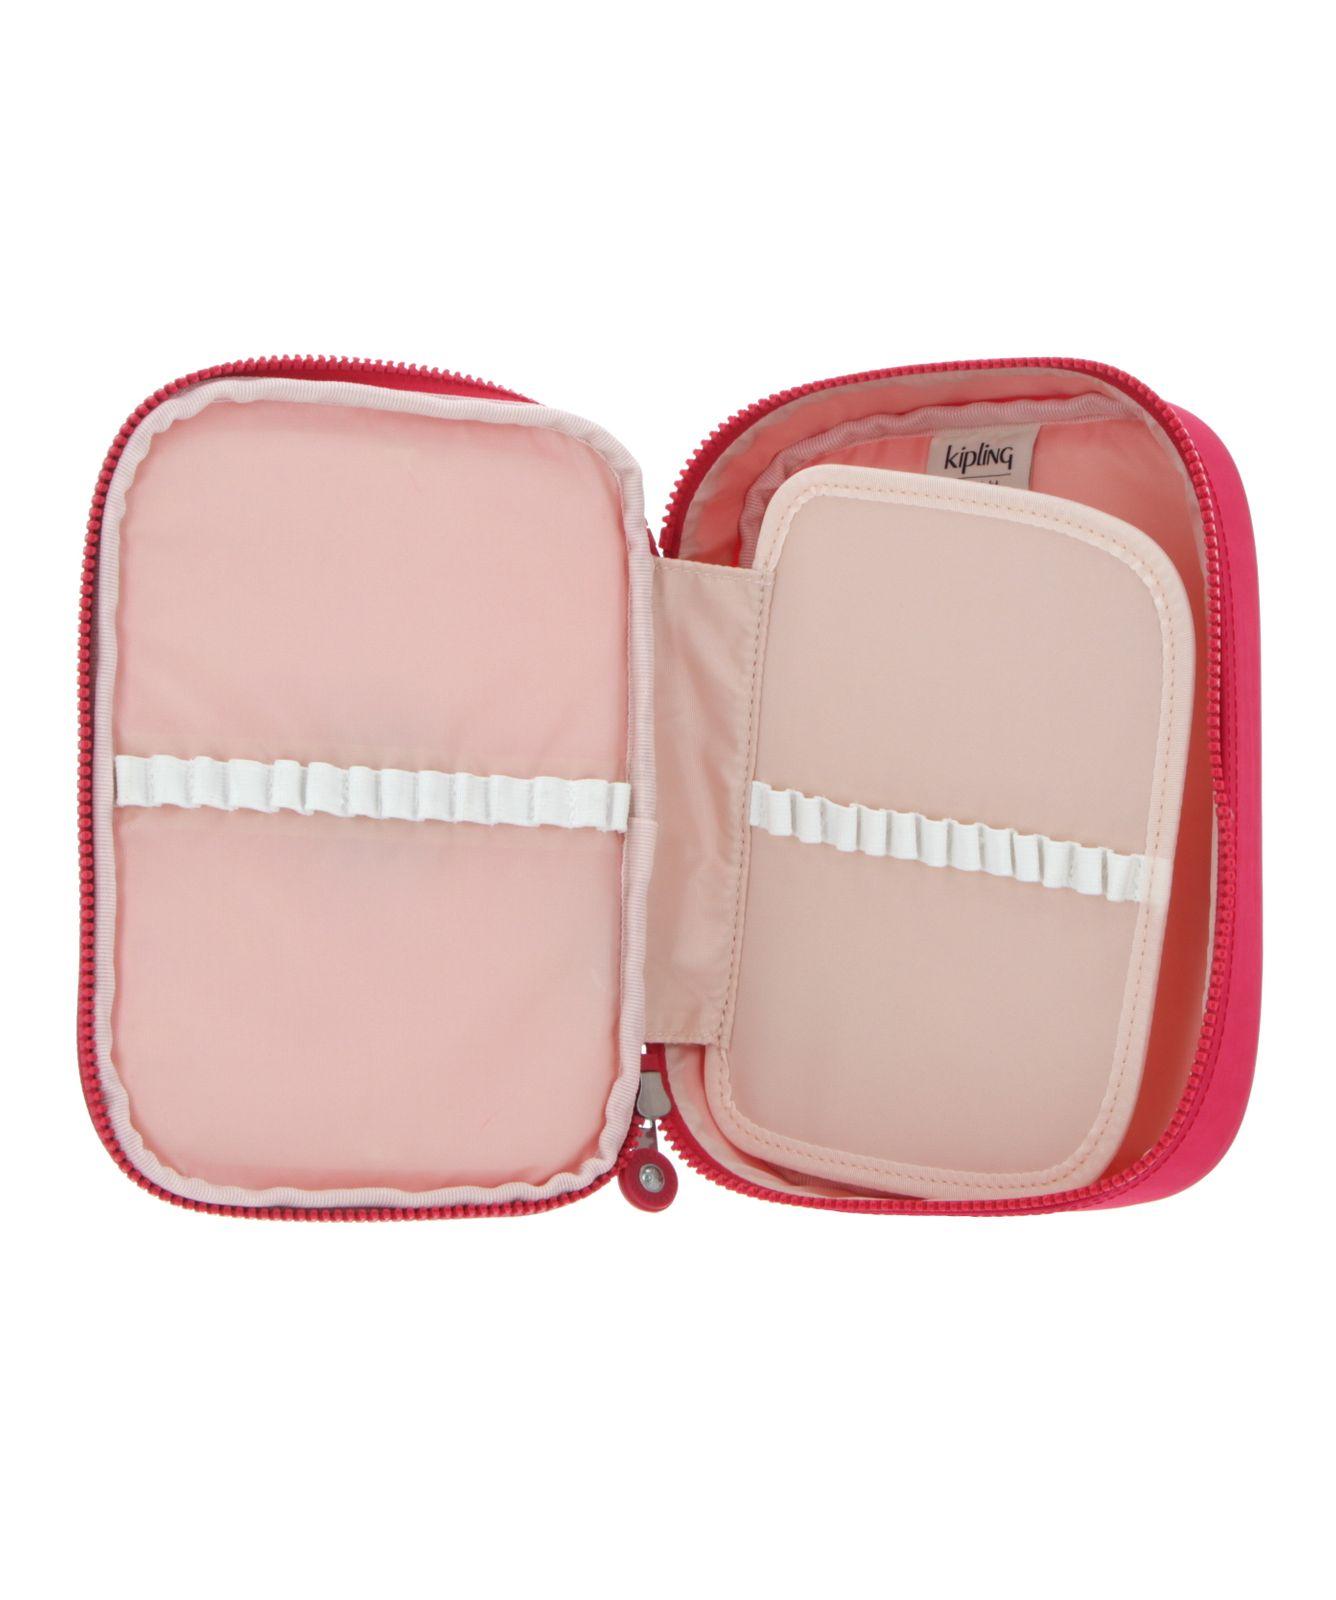 kipling Back To School 100 Pens Pencase L True Pink